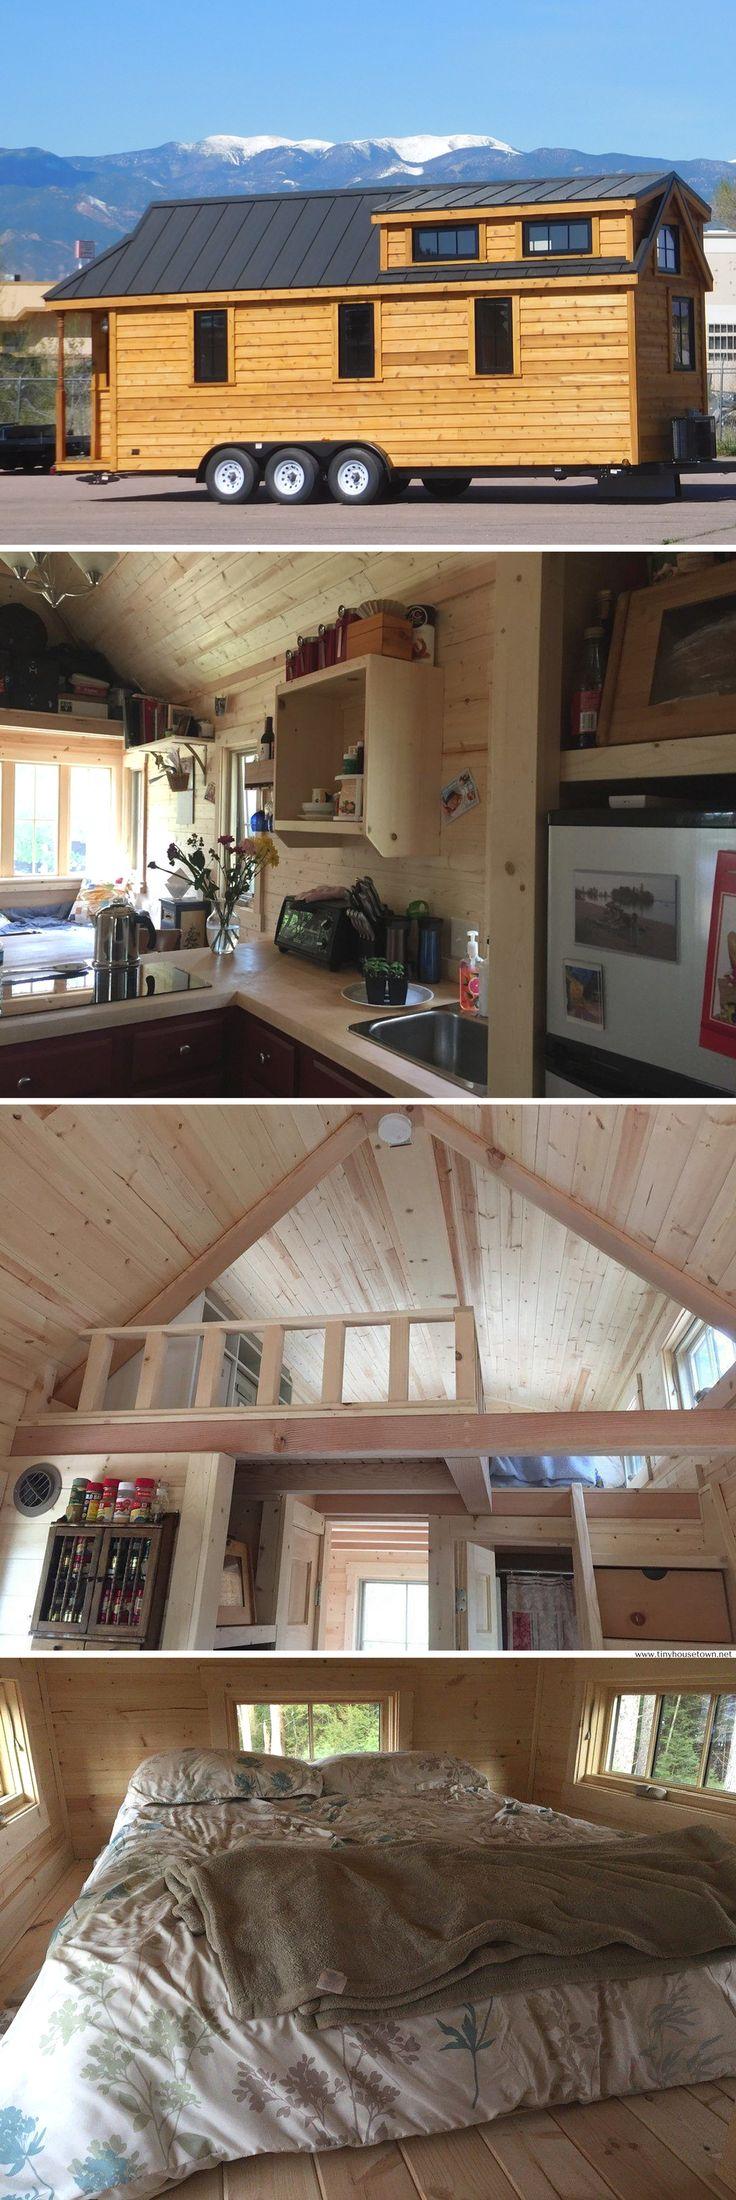 Best 25+ Tiny house trailer ideas on Pinterest   Small garden ...